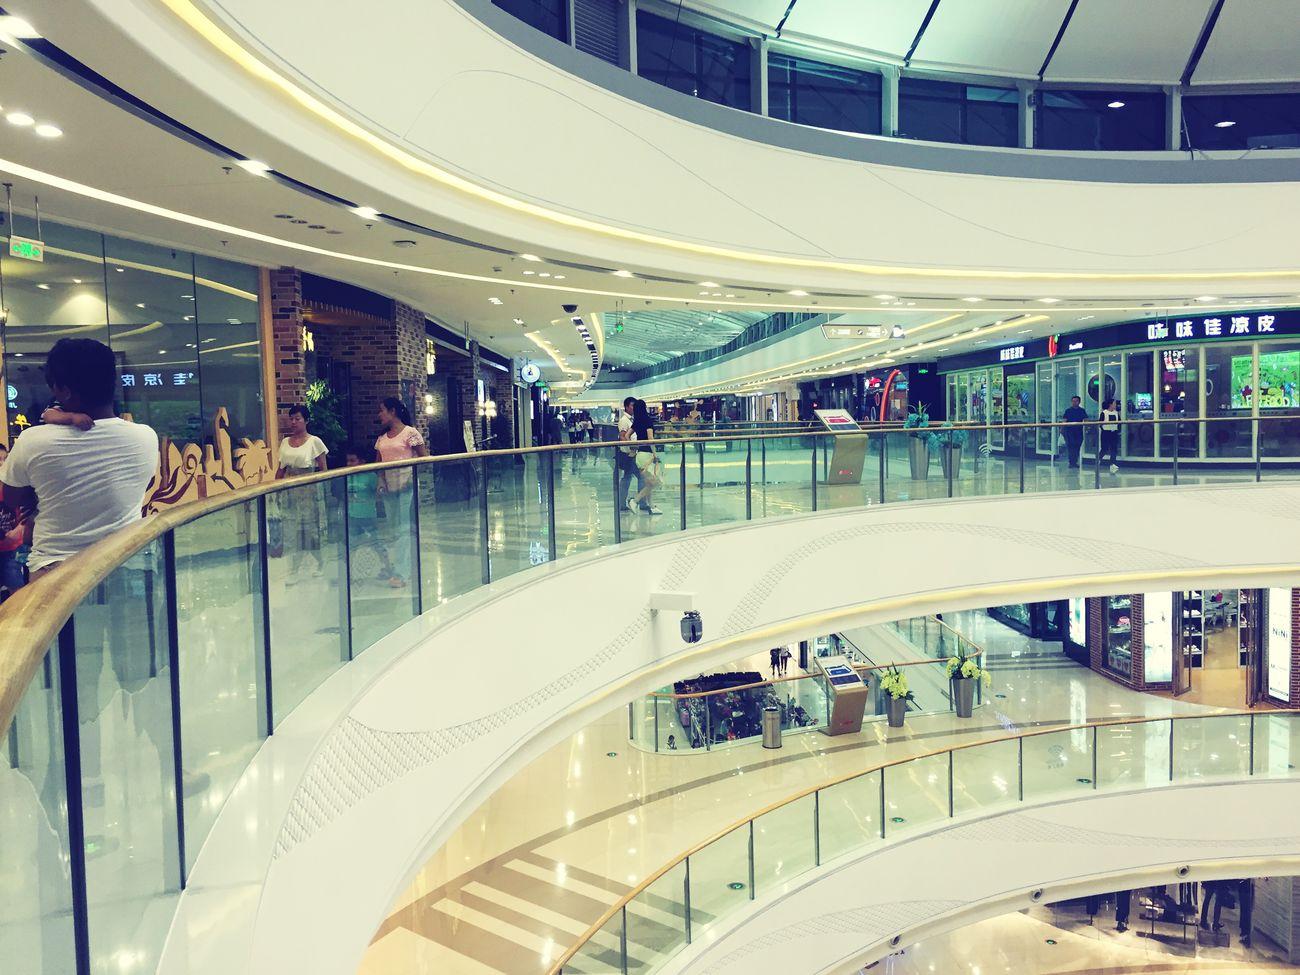 Boring Mall